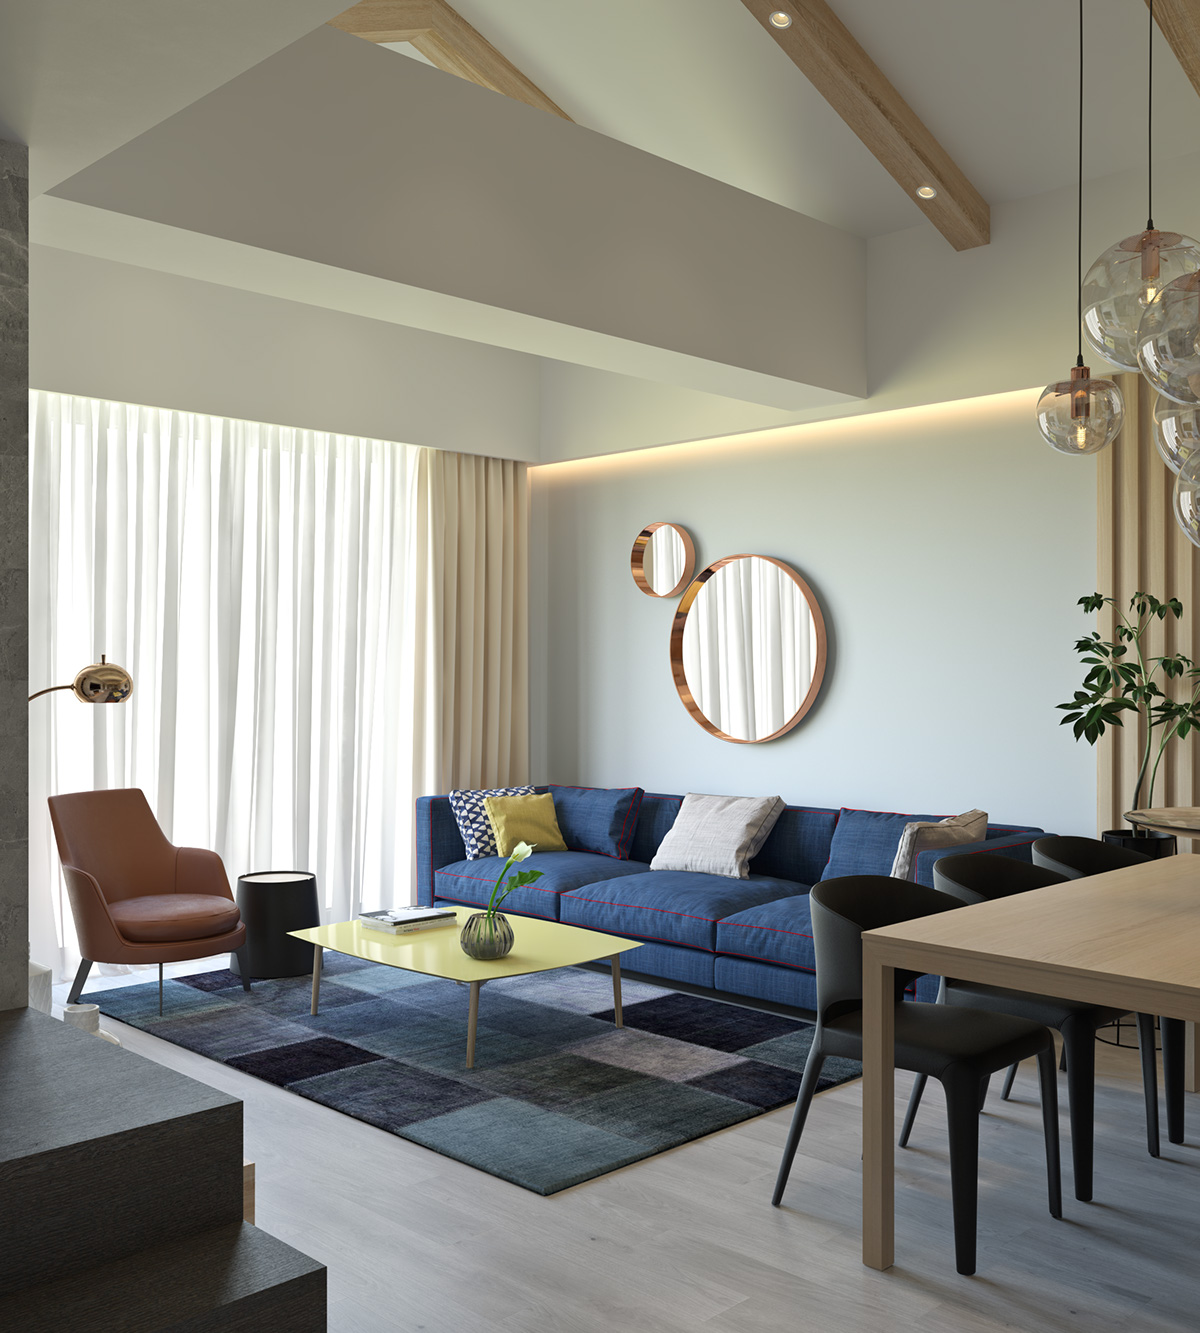 Luxurious Apartments: Luxury Apartment On Behance